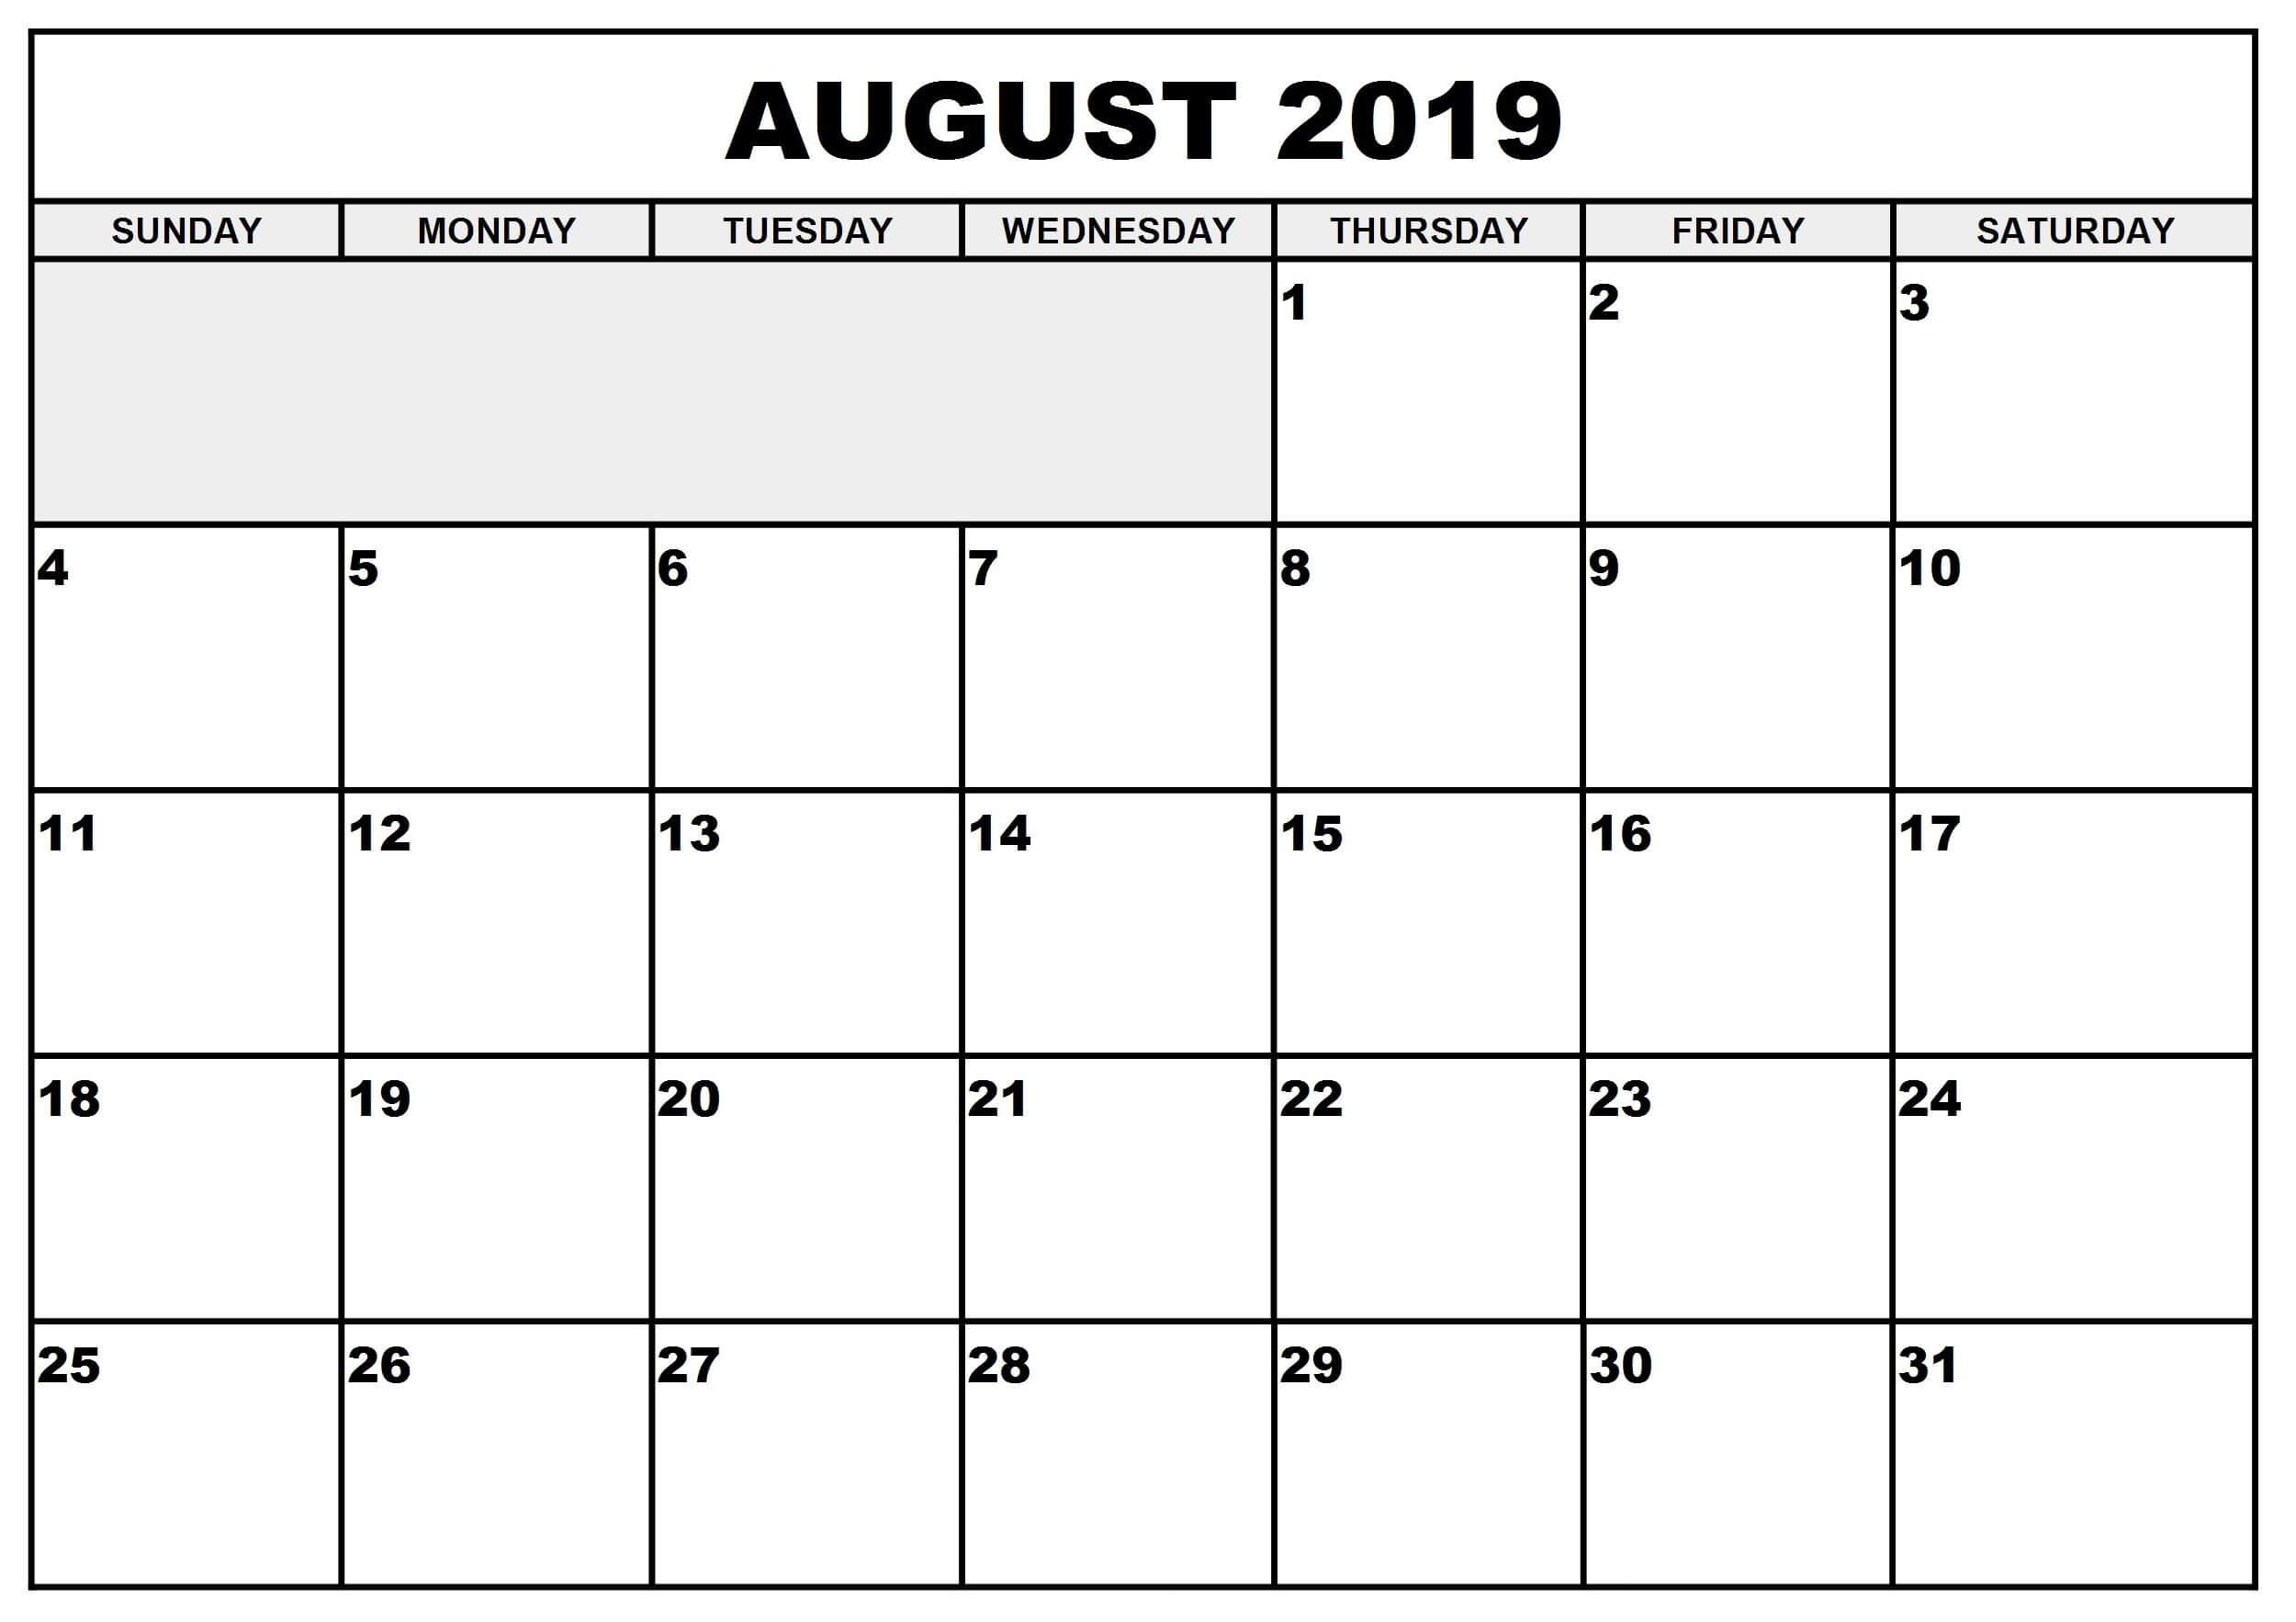 Blank August 2019 Calendar | Free Printable Calendar Shop in August Blank Calendar Monday Through Friday